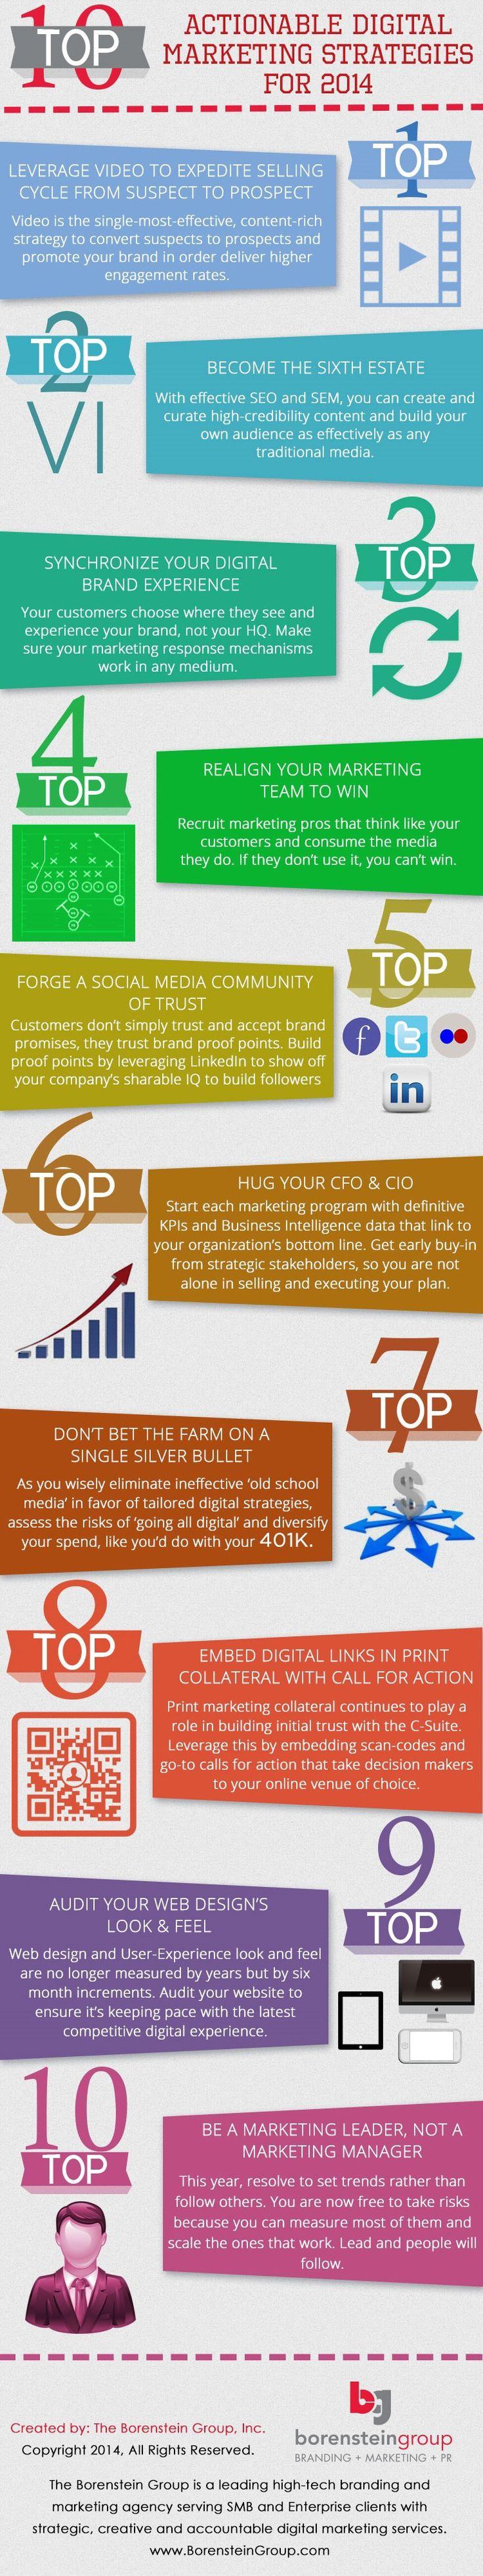 Top 10 Actionable Digital Marketing Strategies for 2014 ...